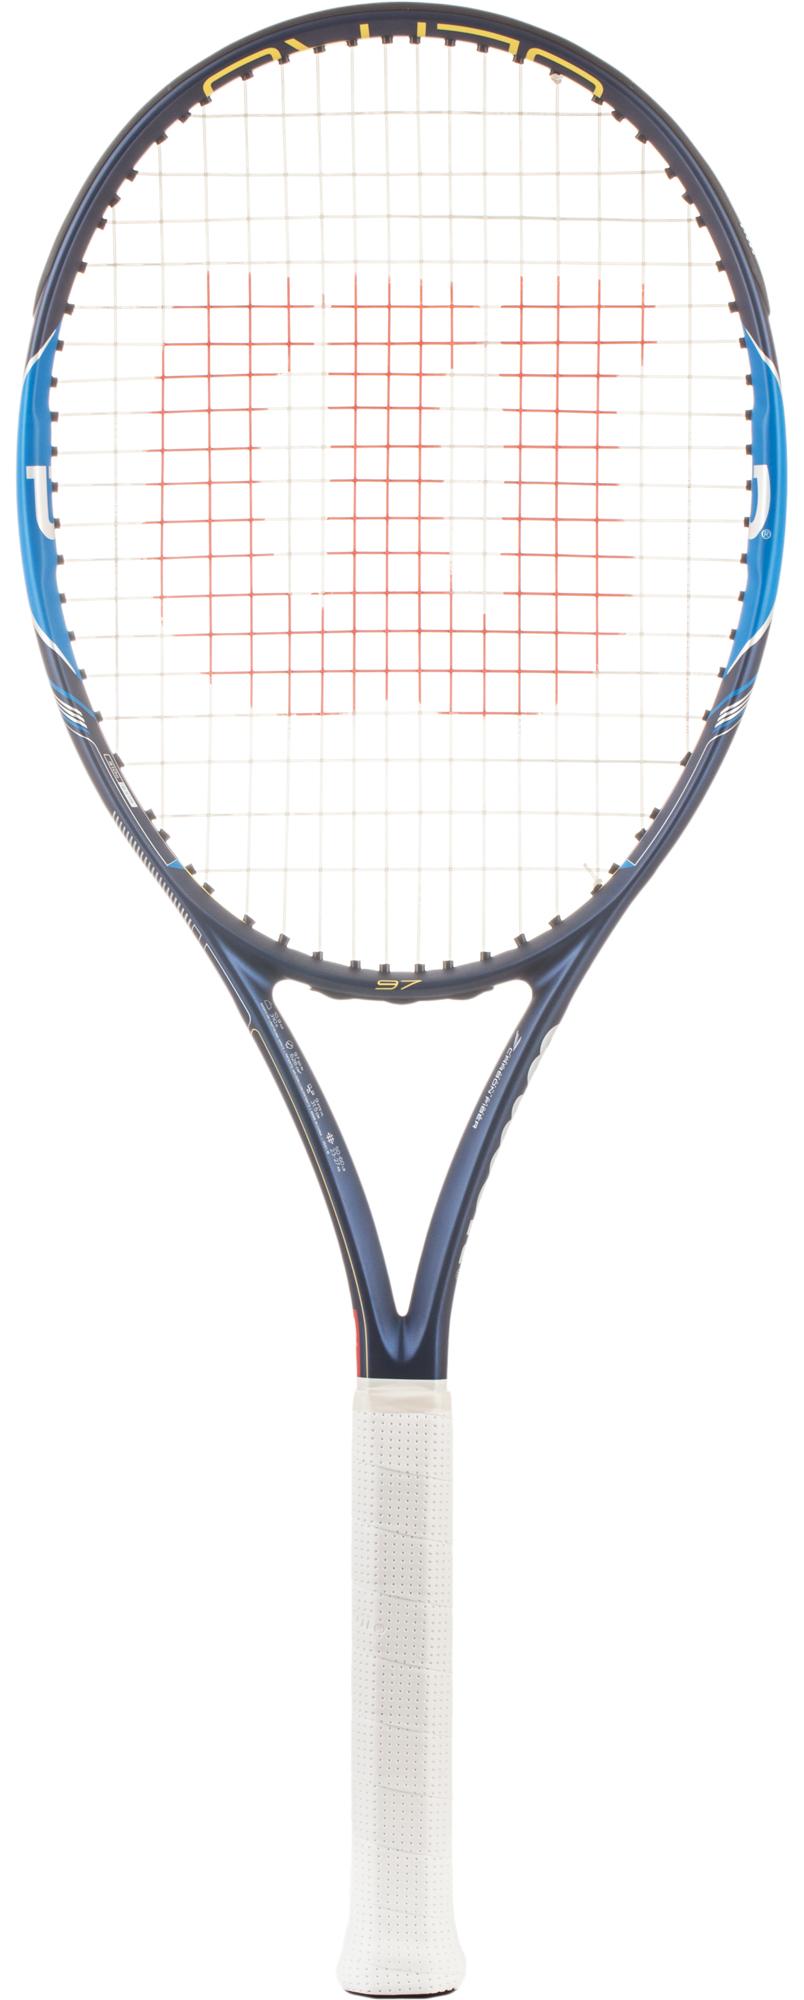 Wilson Ракетка для большого тенниса Wilson Ultra 97, размер 4 wilson набор мячей для большого тенниса wilson australian open 3 ball can размер без размера